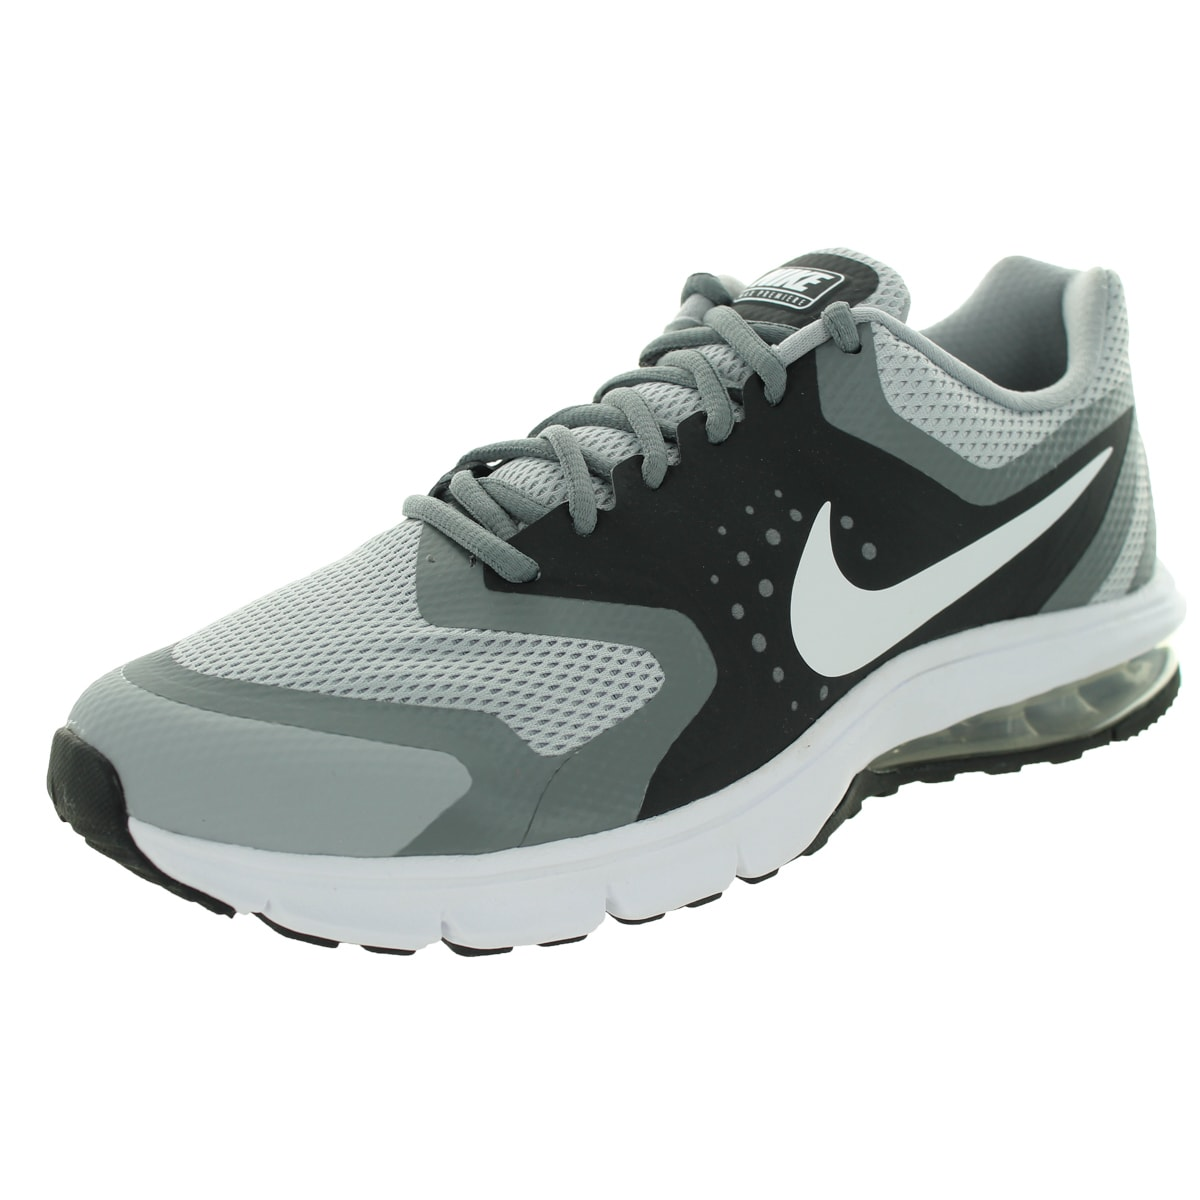 Nike Men's Air Max Premiere Run Wolf Grey/White/Grey/Anth...